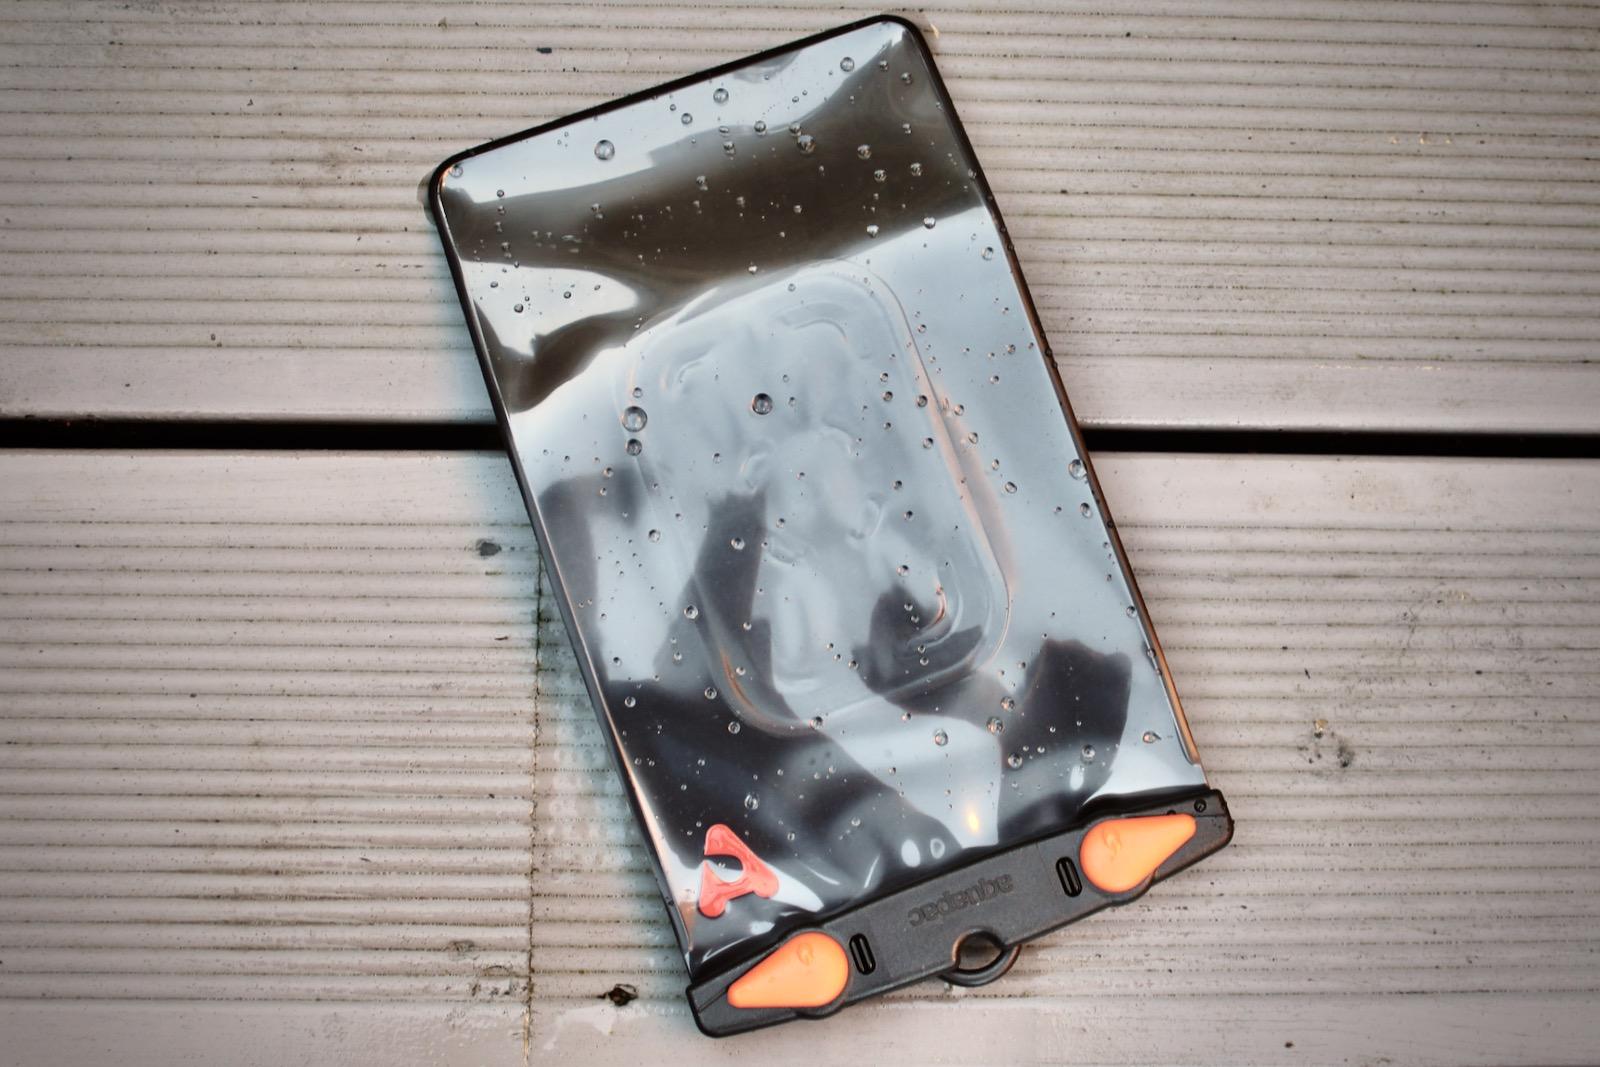 Aquapac Extreme Pro PlusPlus Waterproof Phone Case